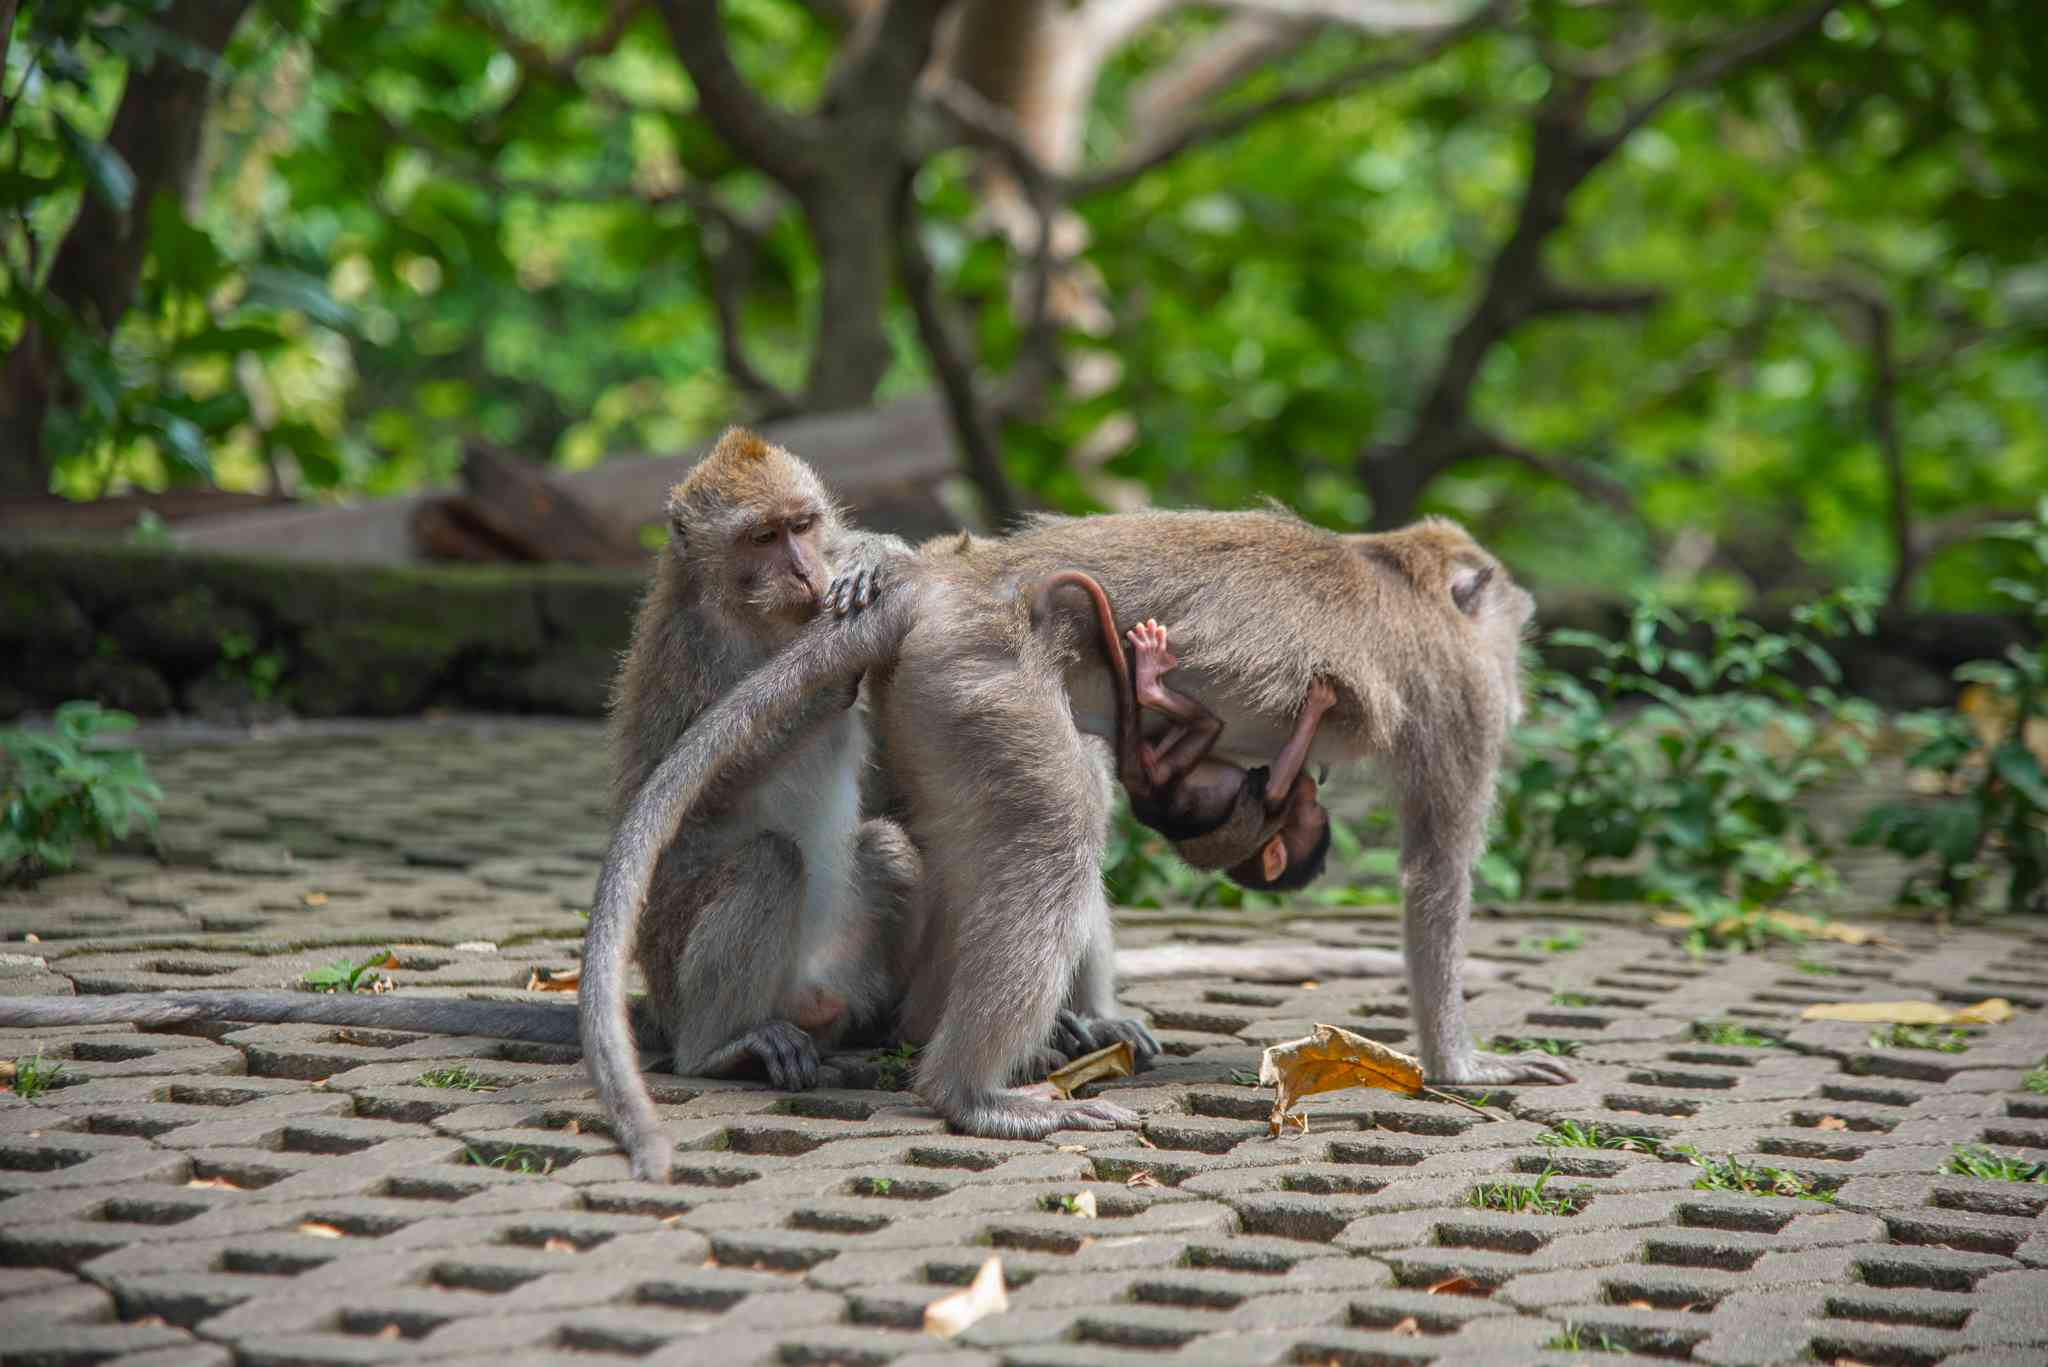 Monkeys in the Ubud Monkey Forest